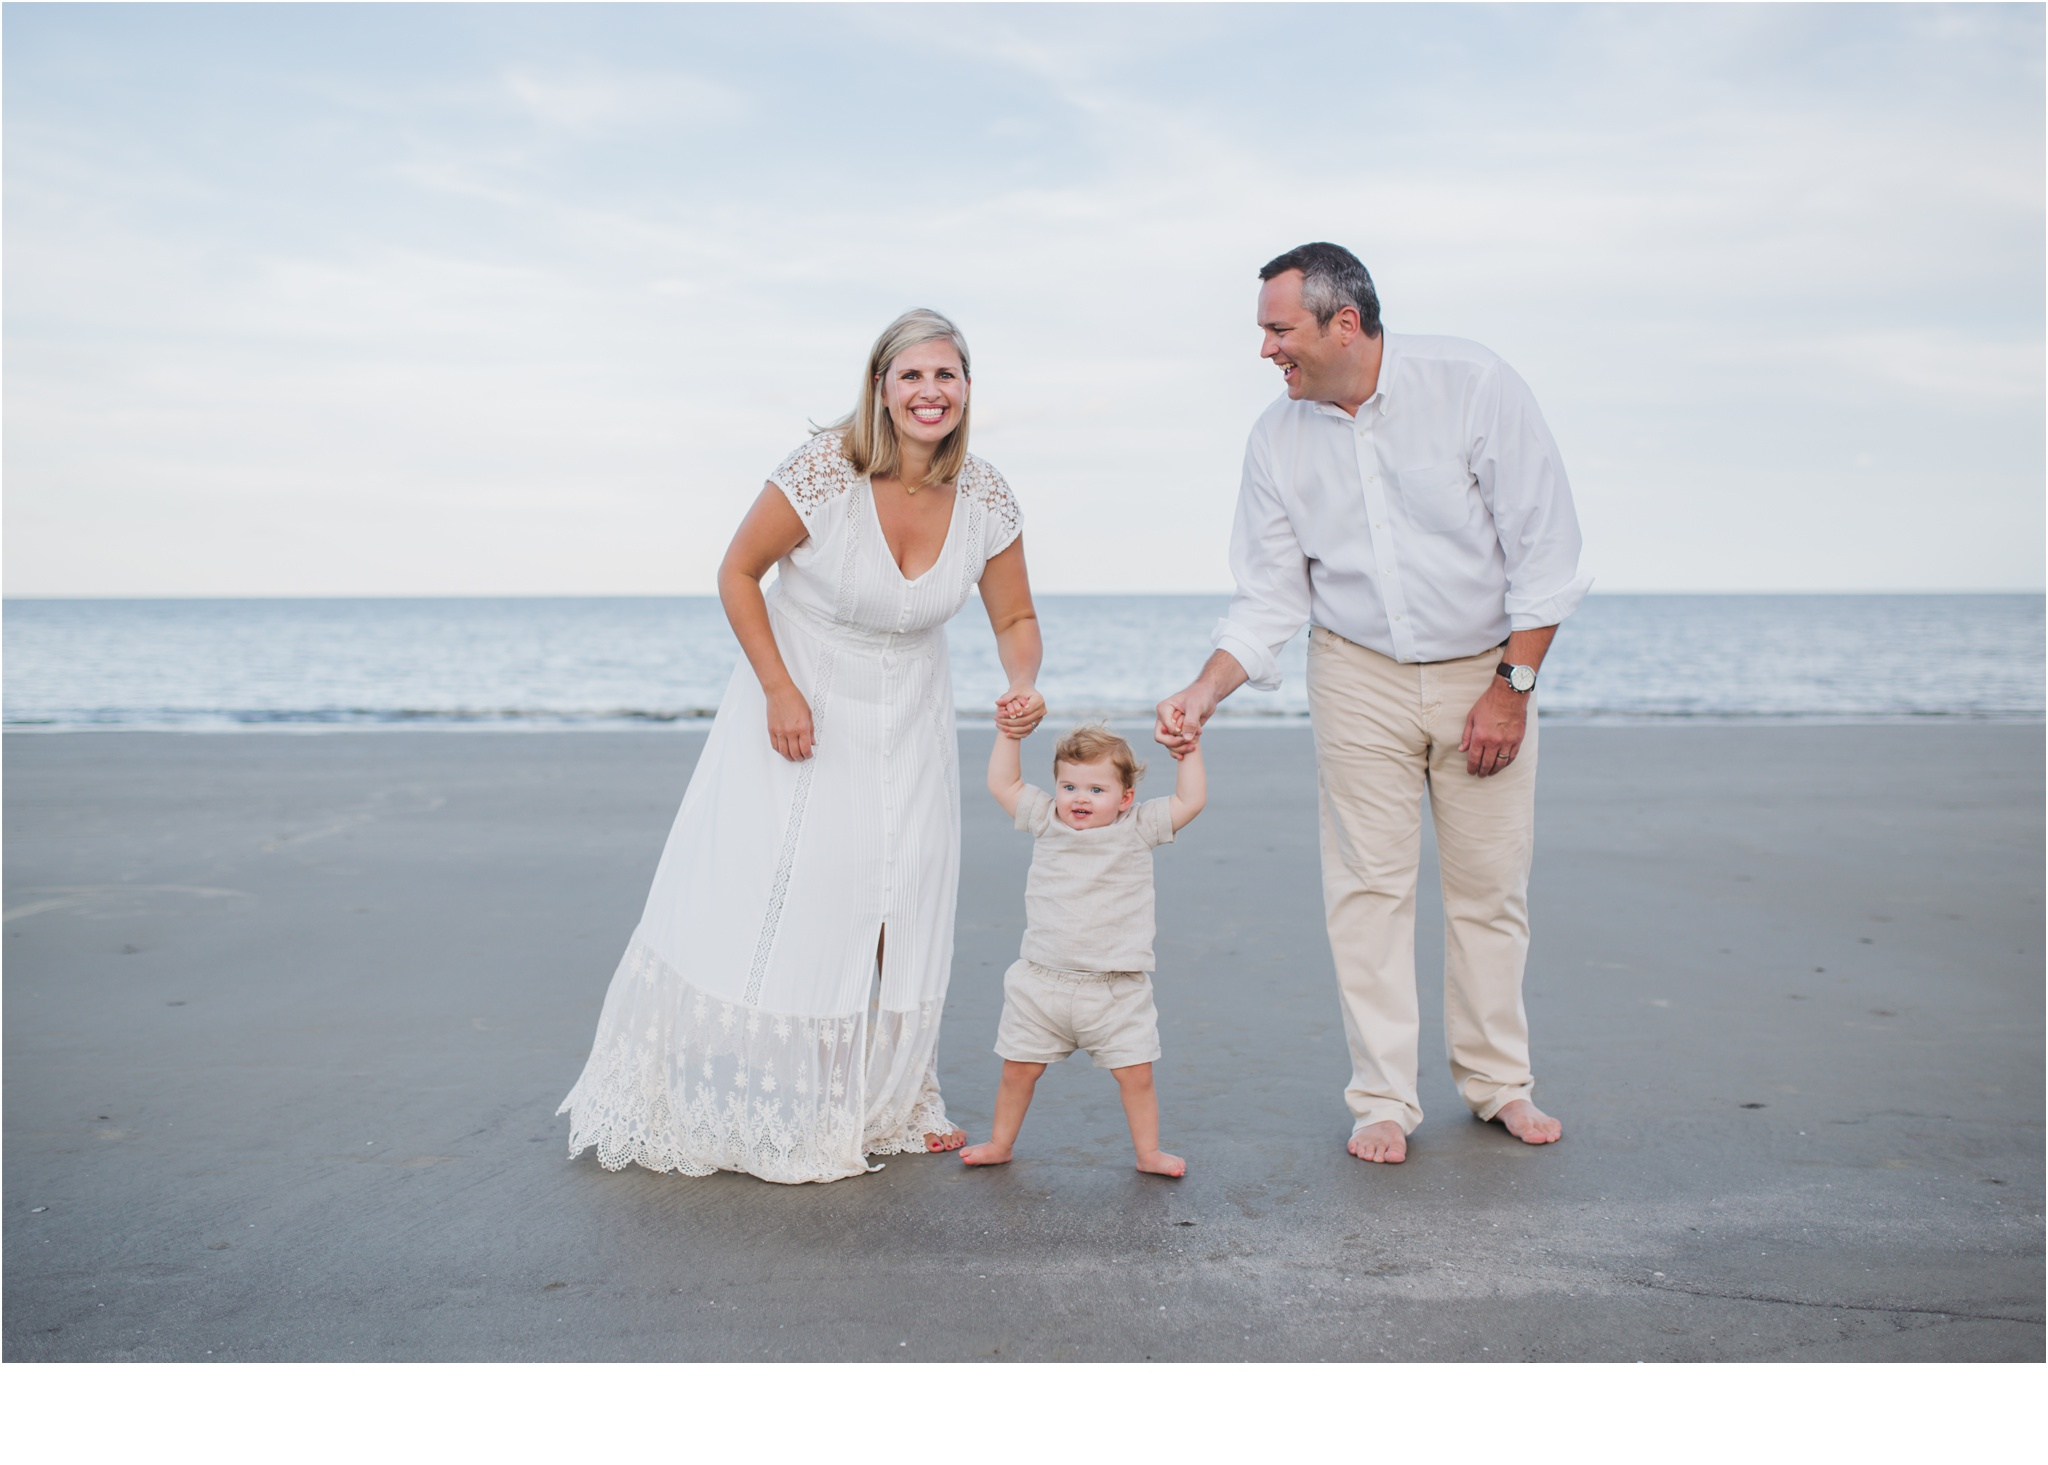 Rainey_Gregg_Photography_St._Simons_Island_Georgia_California_Wedding_Portrait_Photography_1030.jpg